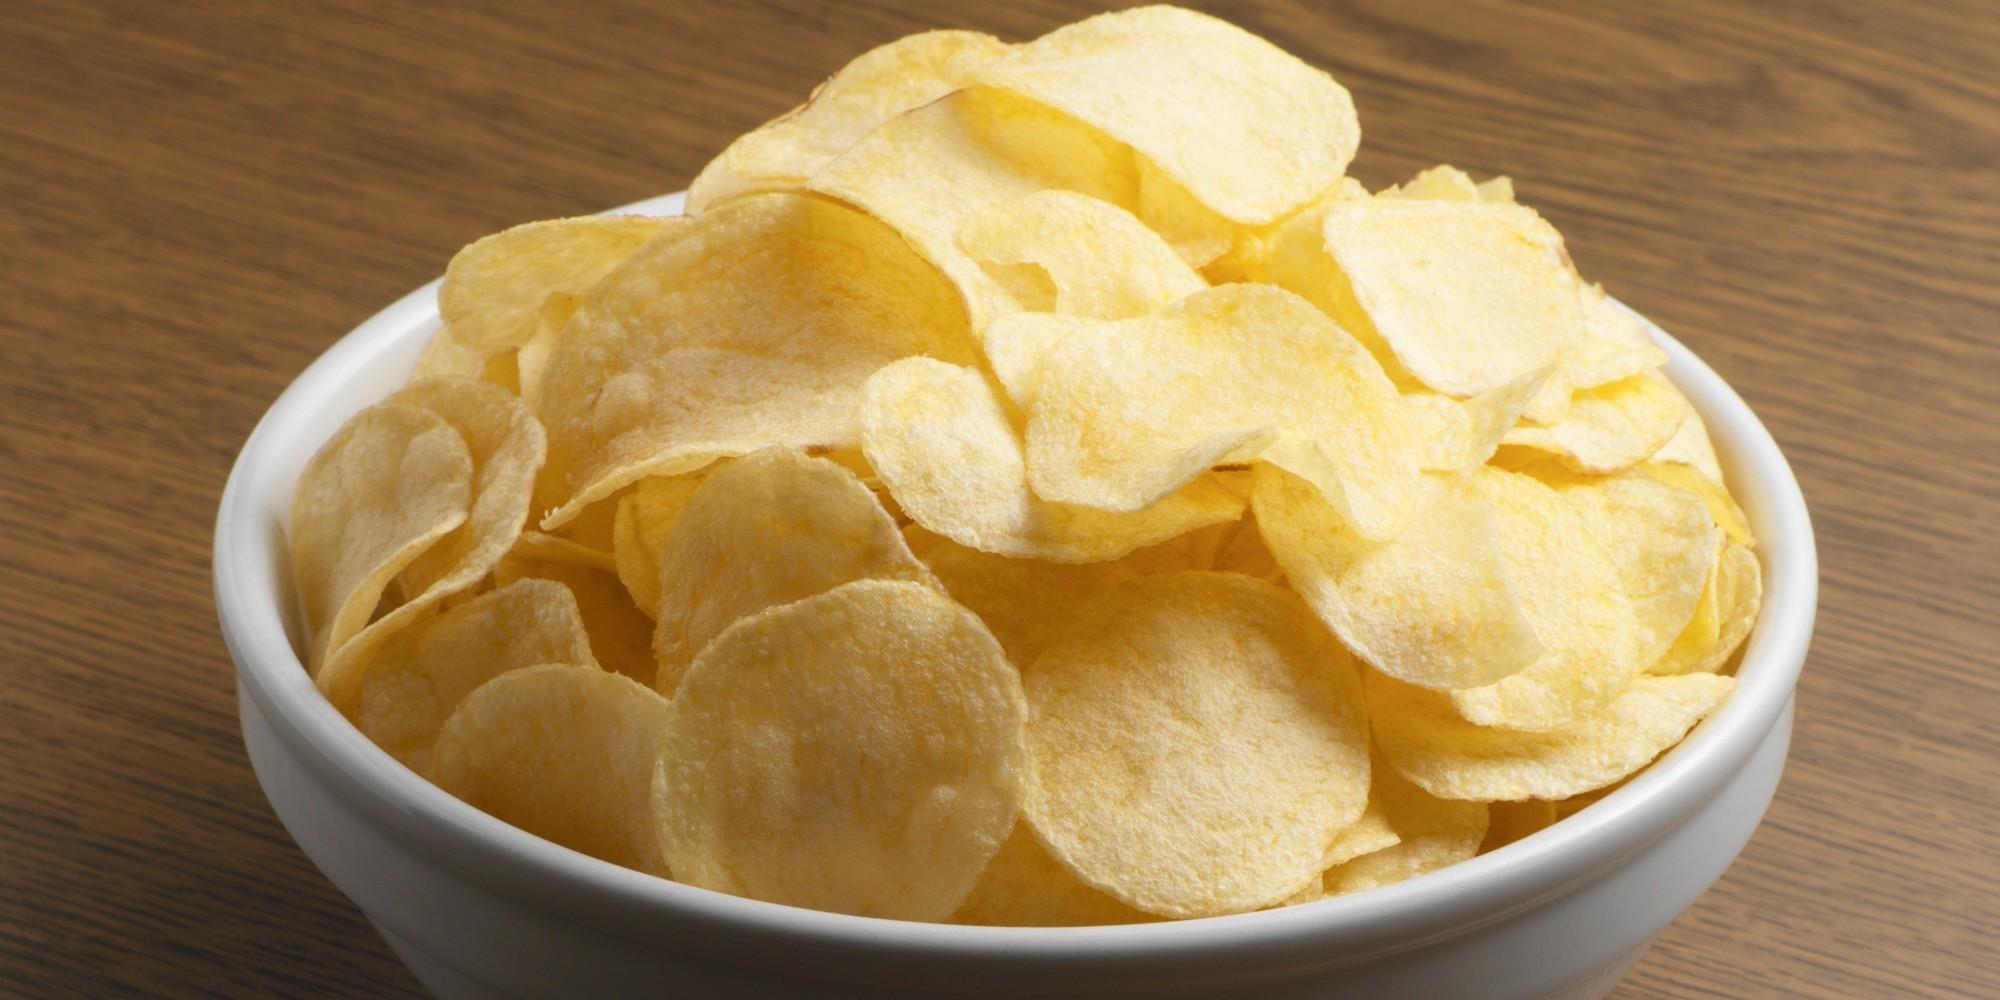 Resepi Homemade Potato Chips Ala Pringles Nyumms Pamapedia